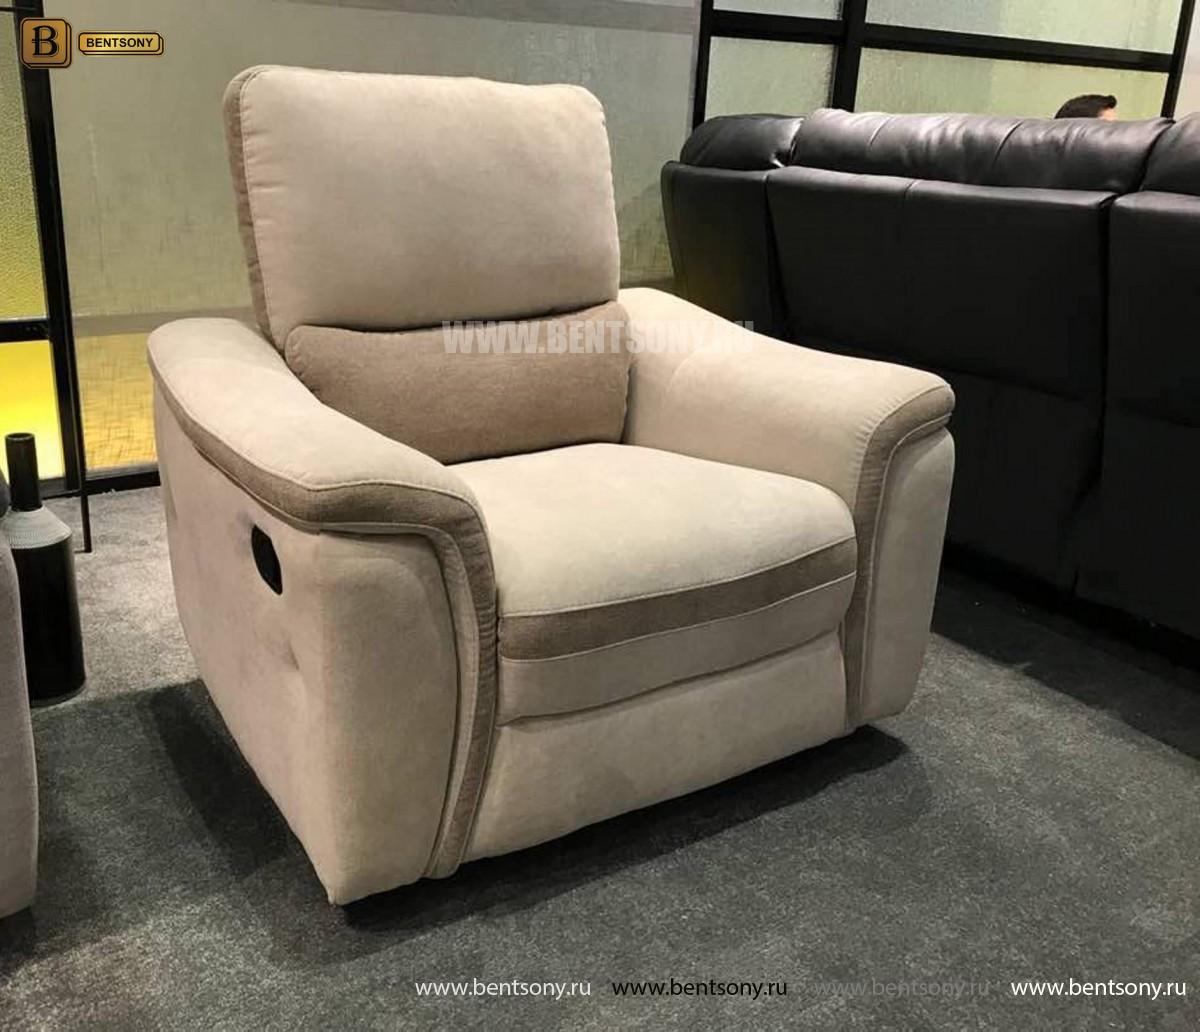 Кресло Фатто с реклайнером (Алькантара) каталог мебели с ценами